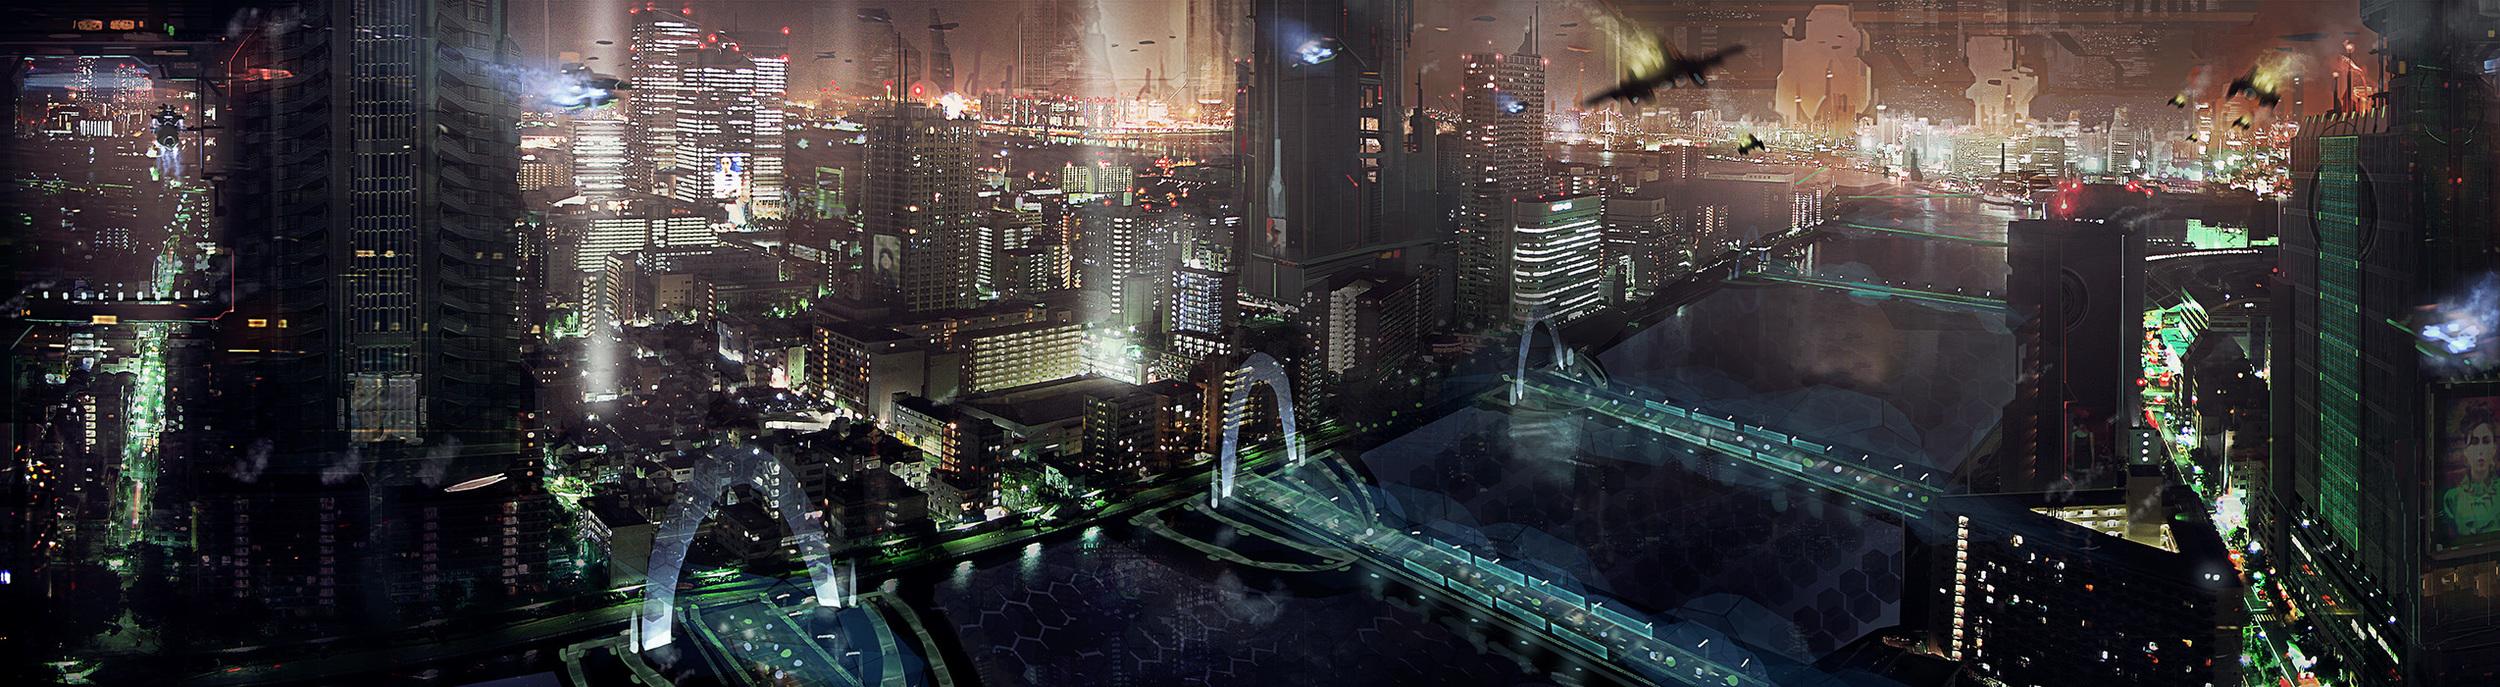 cityscape-matte.jpg